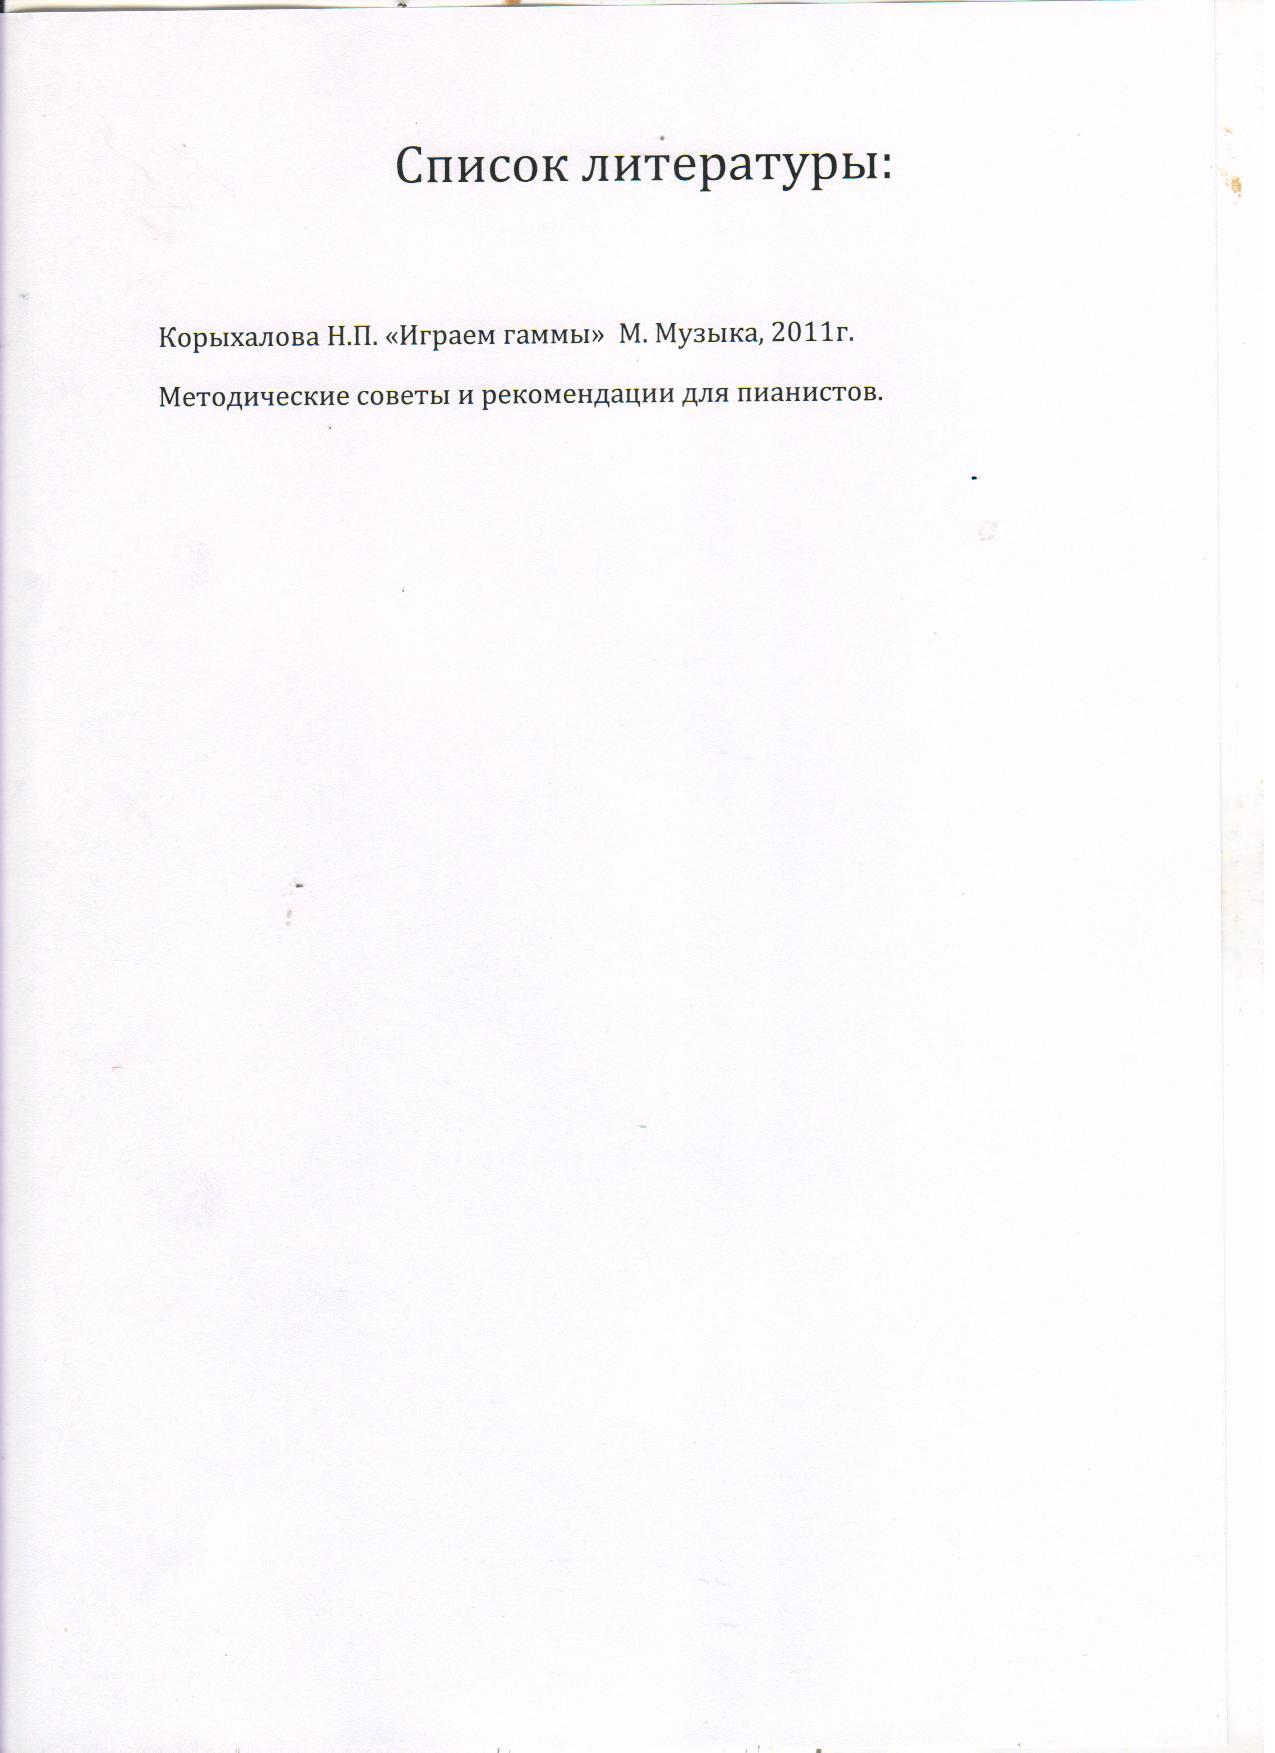 C:\Documents and Settings\Учитель\Рабочий стол\гаммы 15.jpg